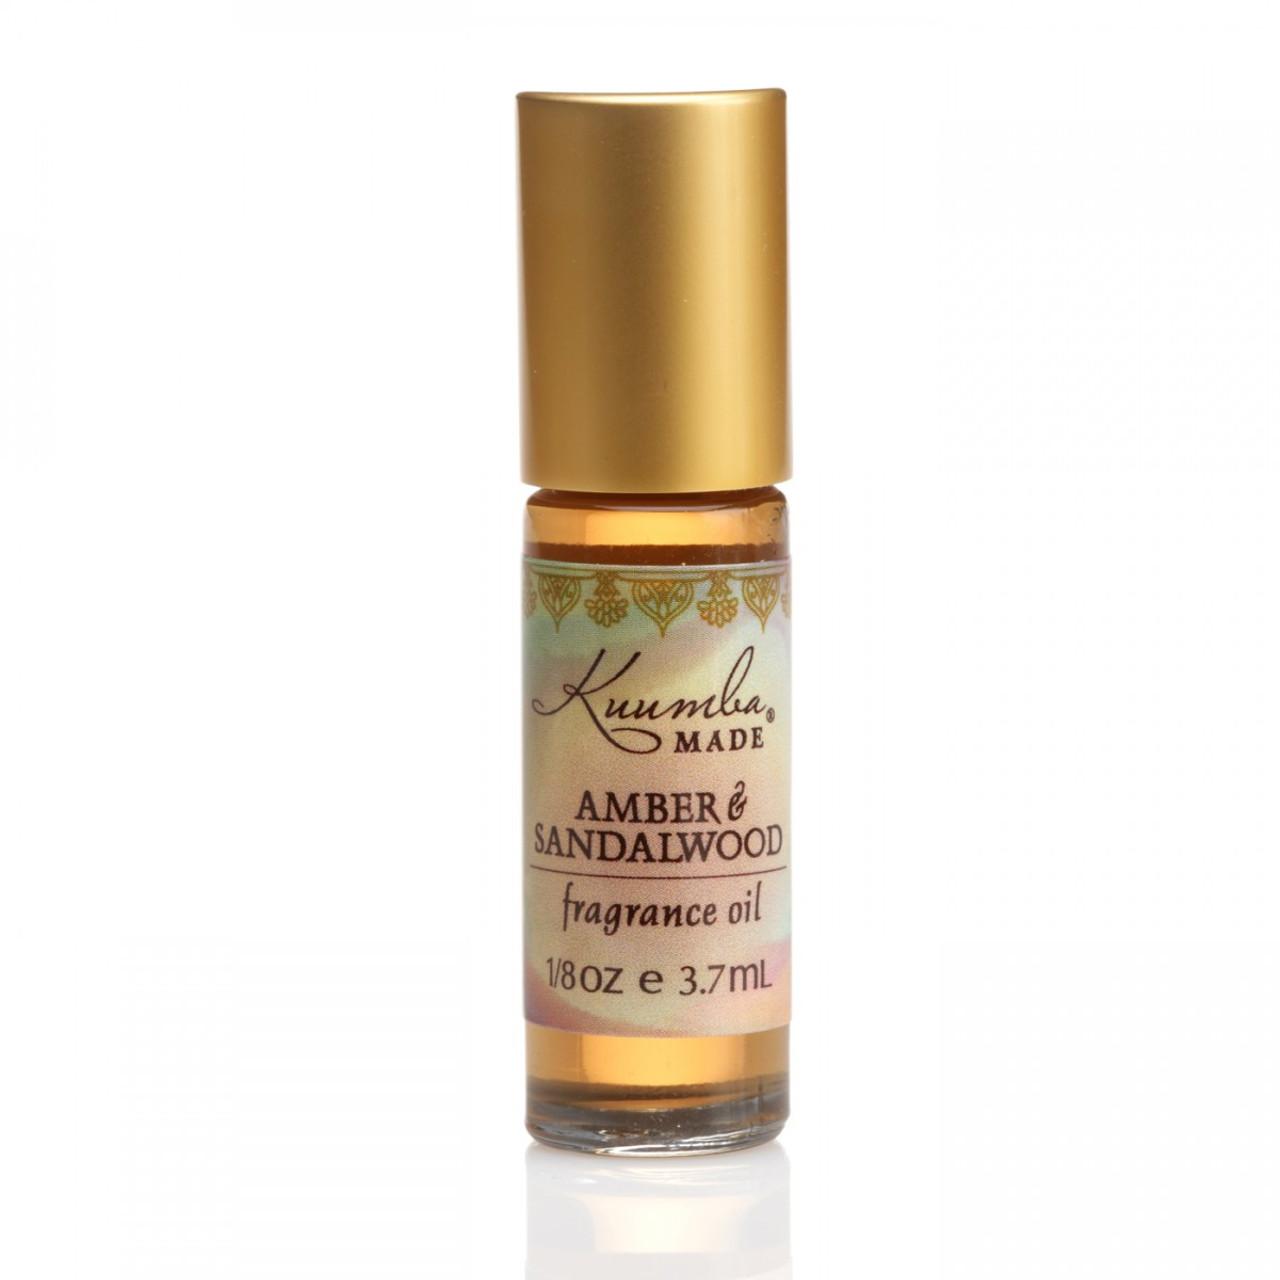 Kuumba Made Amber & Sandalwood Fragrance Oil